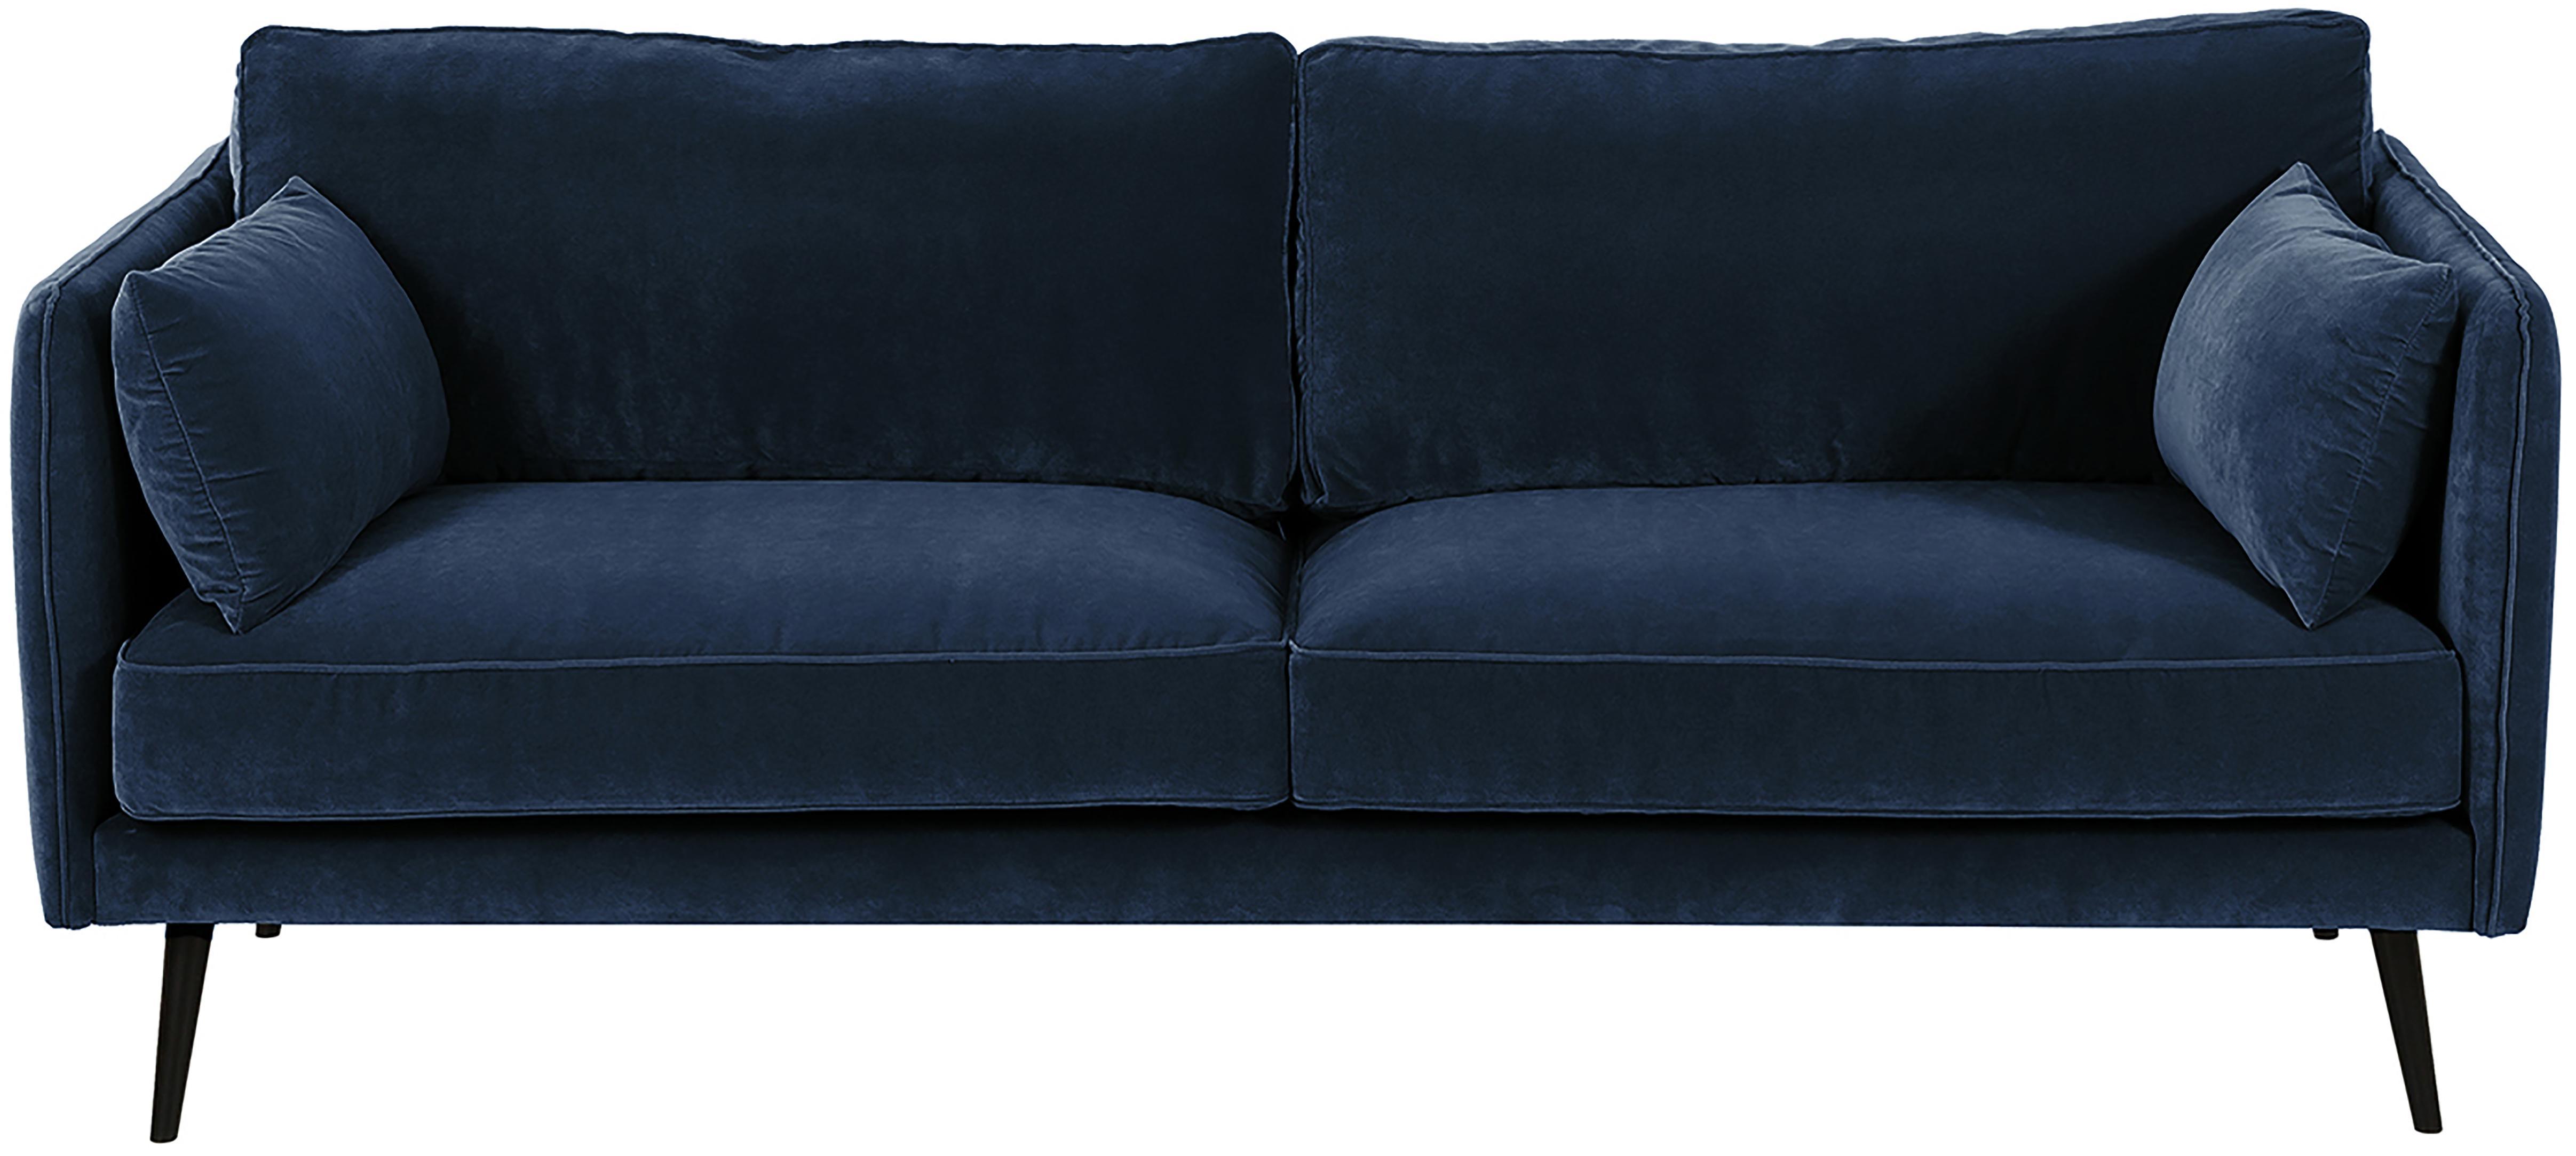 Samt-Sofa Paola (3-Sitzer), Bezug: Samt (Polyester) 70.000 S, Gestell: Massives Fichtenholz, Spa, Samt Blau, B 209 x T 95 cm